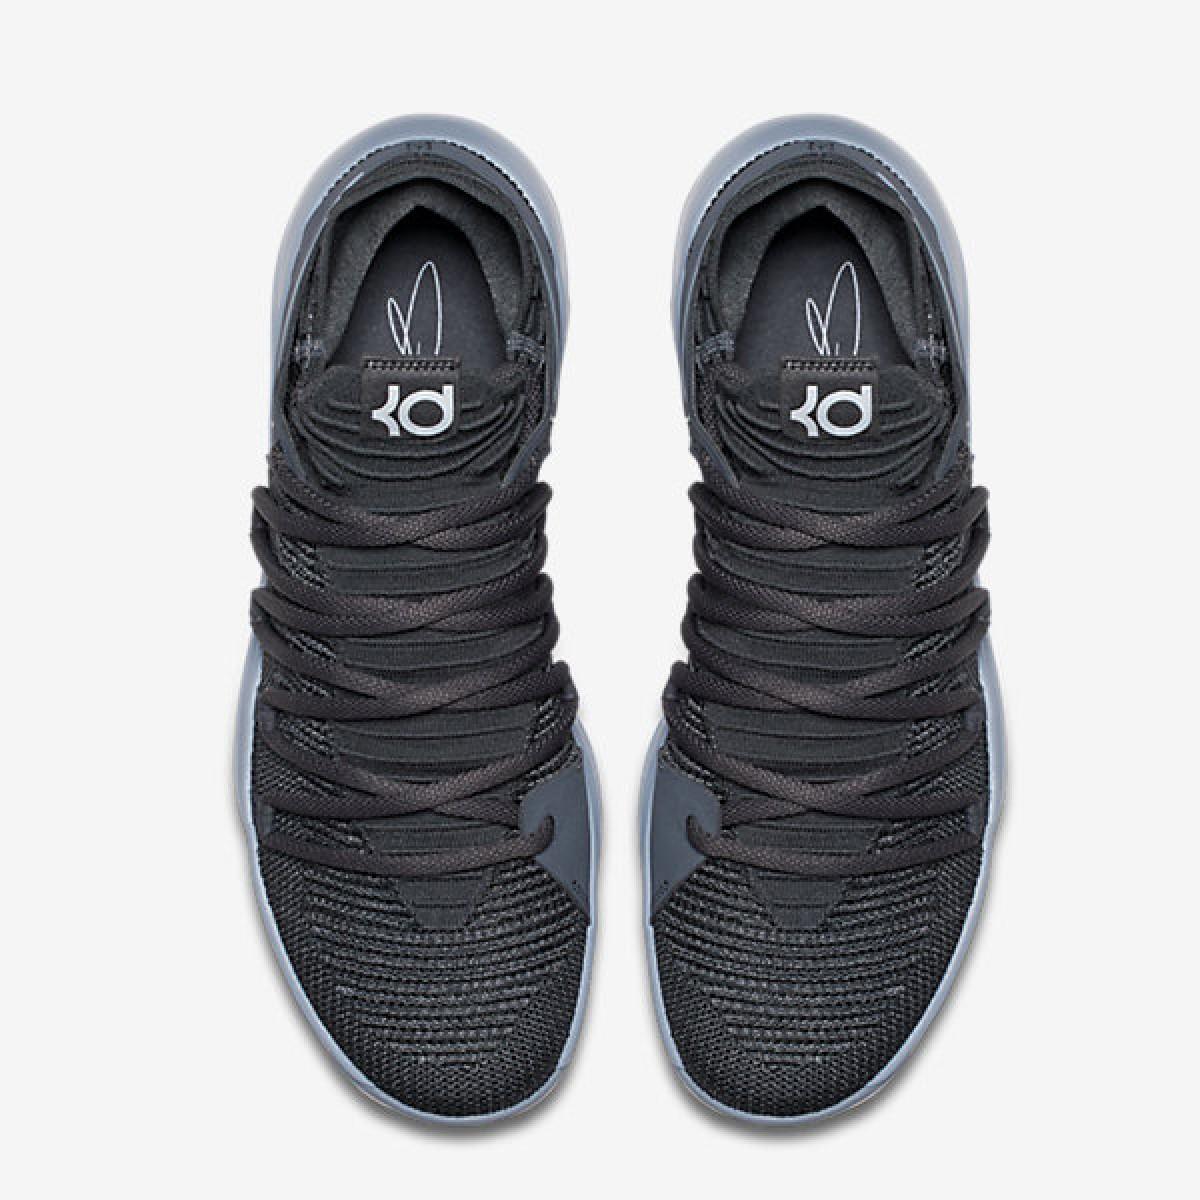 Nike Zoom KD 10 'Dark Grey' 897815-005